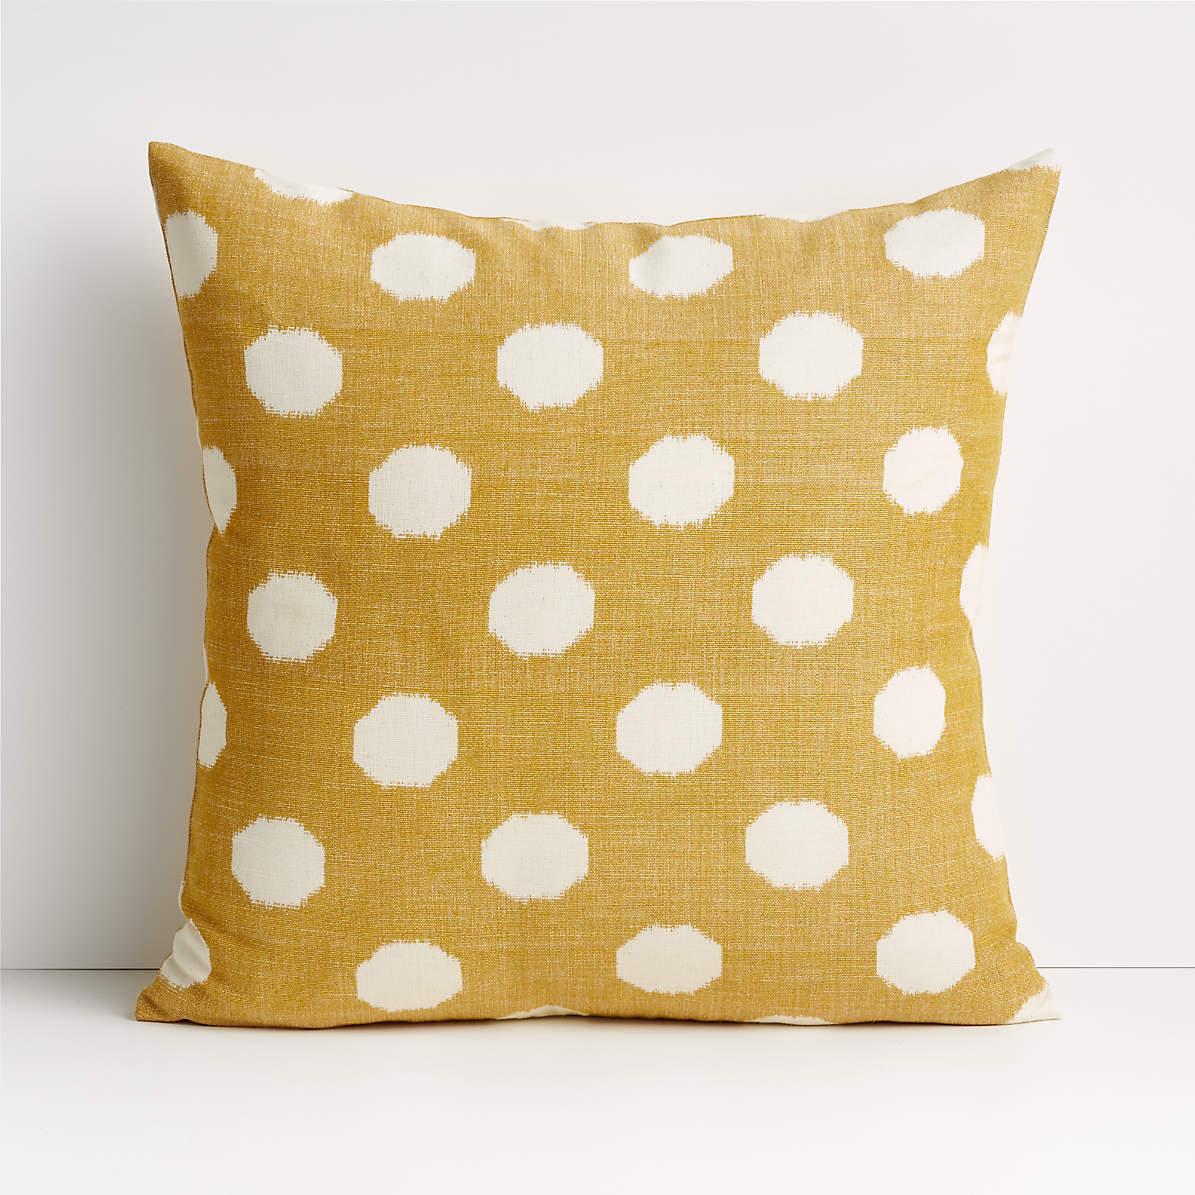 anellis 20 golden yellow polka dot pillow cover